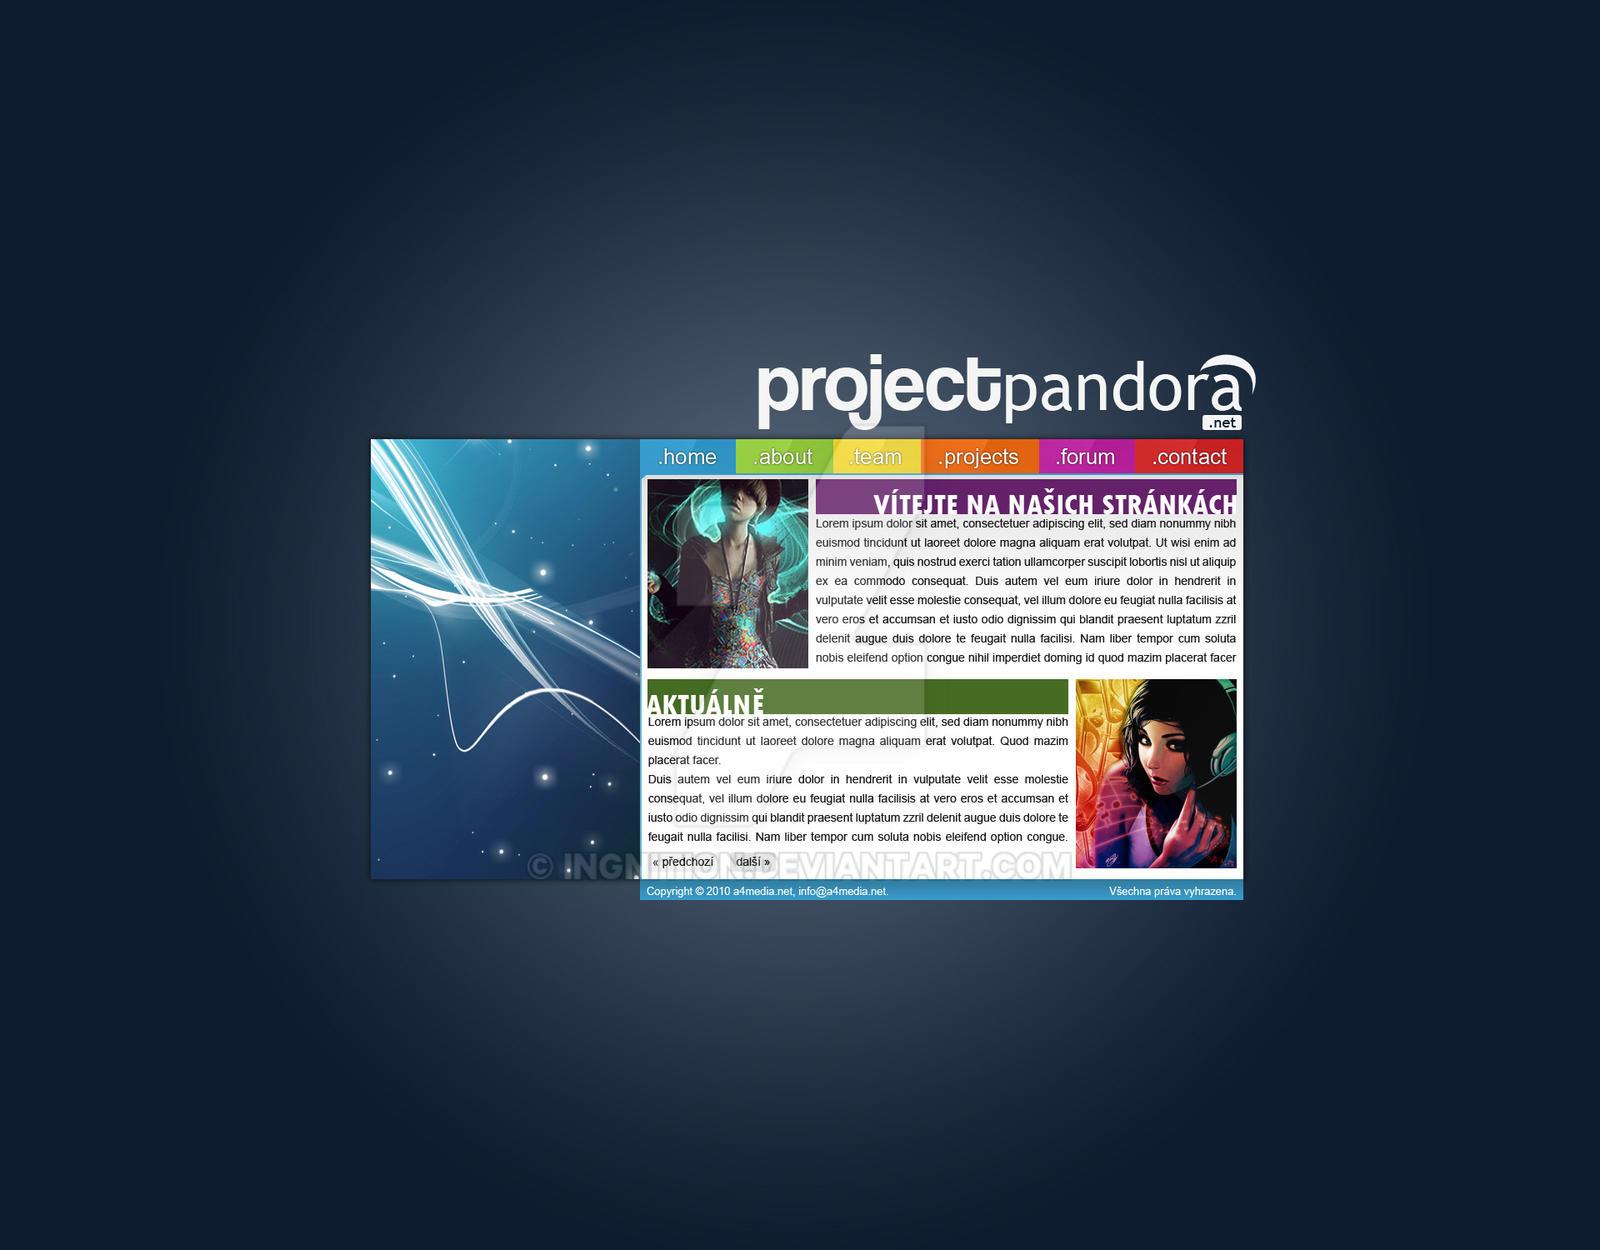 Project Pandora v.1 by Ingnition